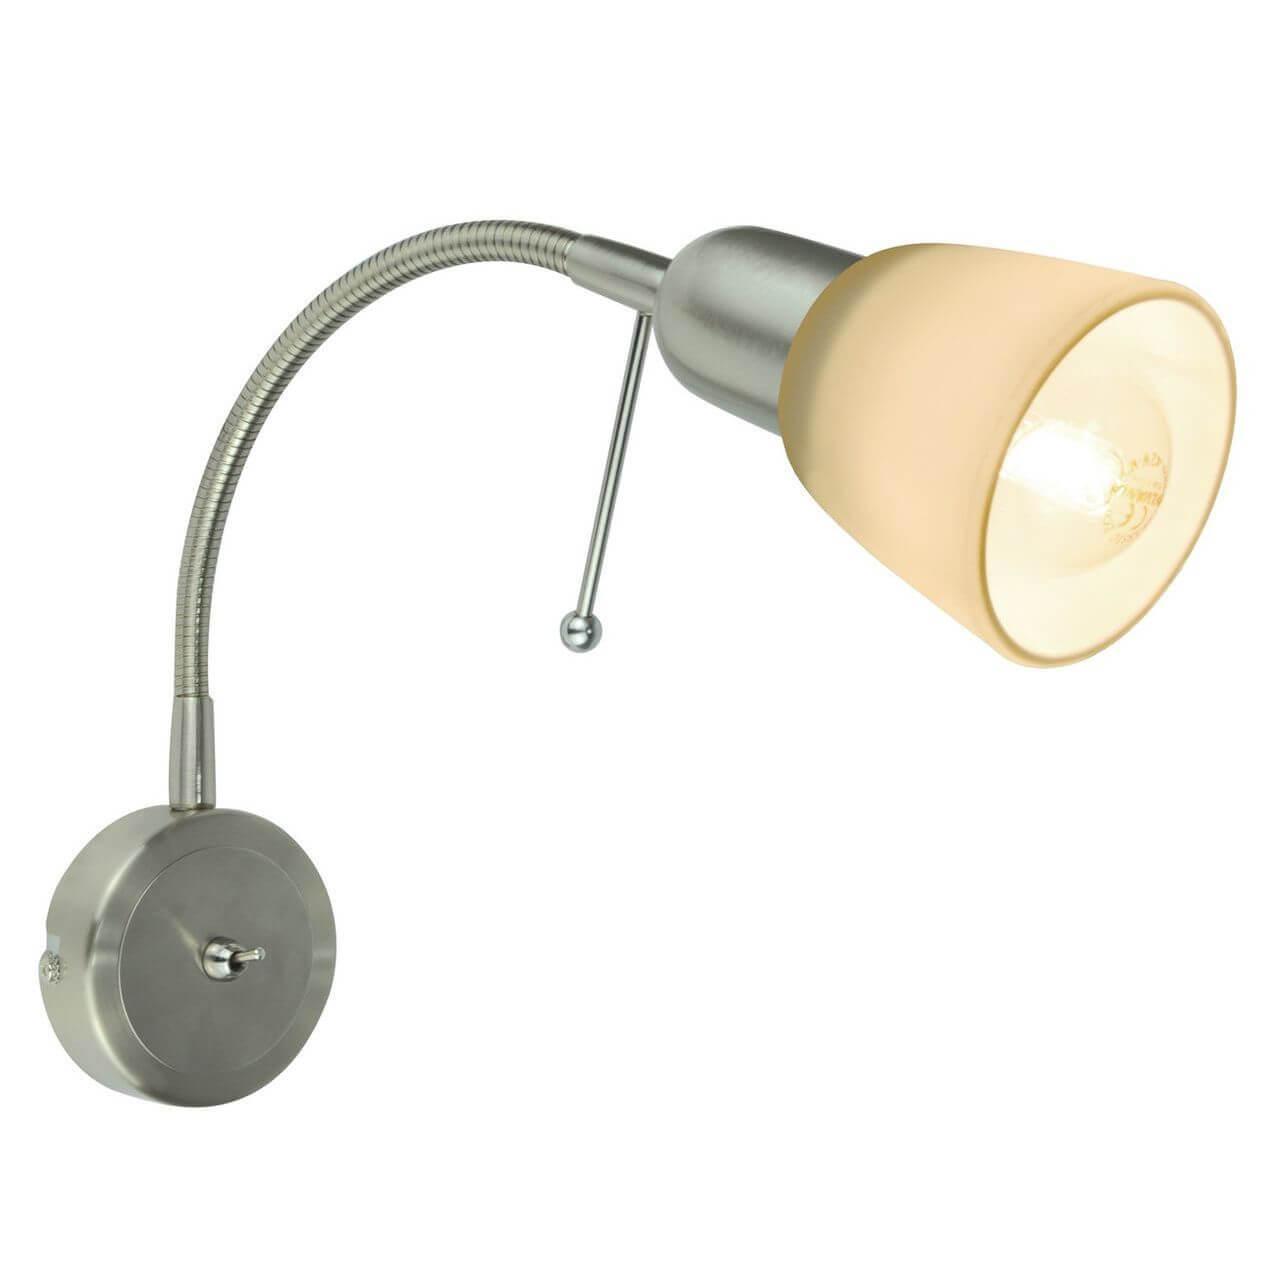 Спот Arte Lamp A7009AP-1SS Lettura arte lamp светильник спот artelamp a7005ap 1ss